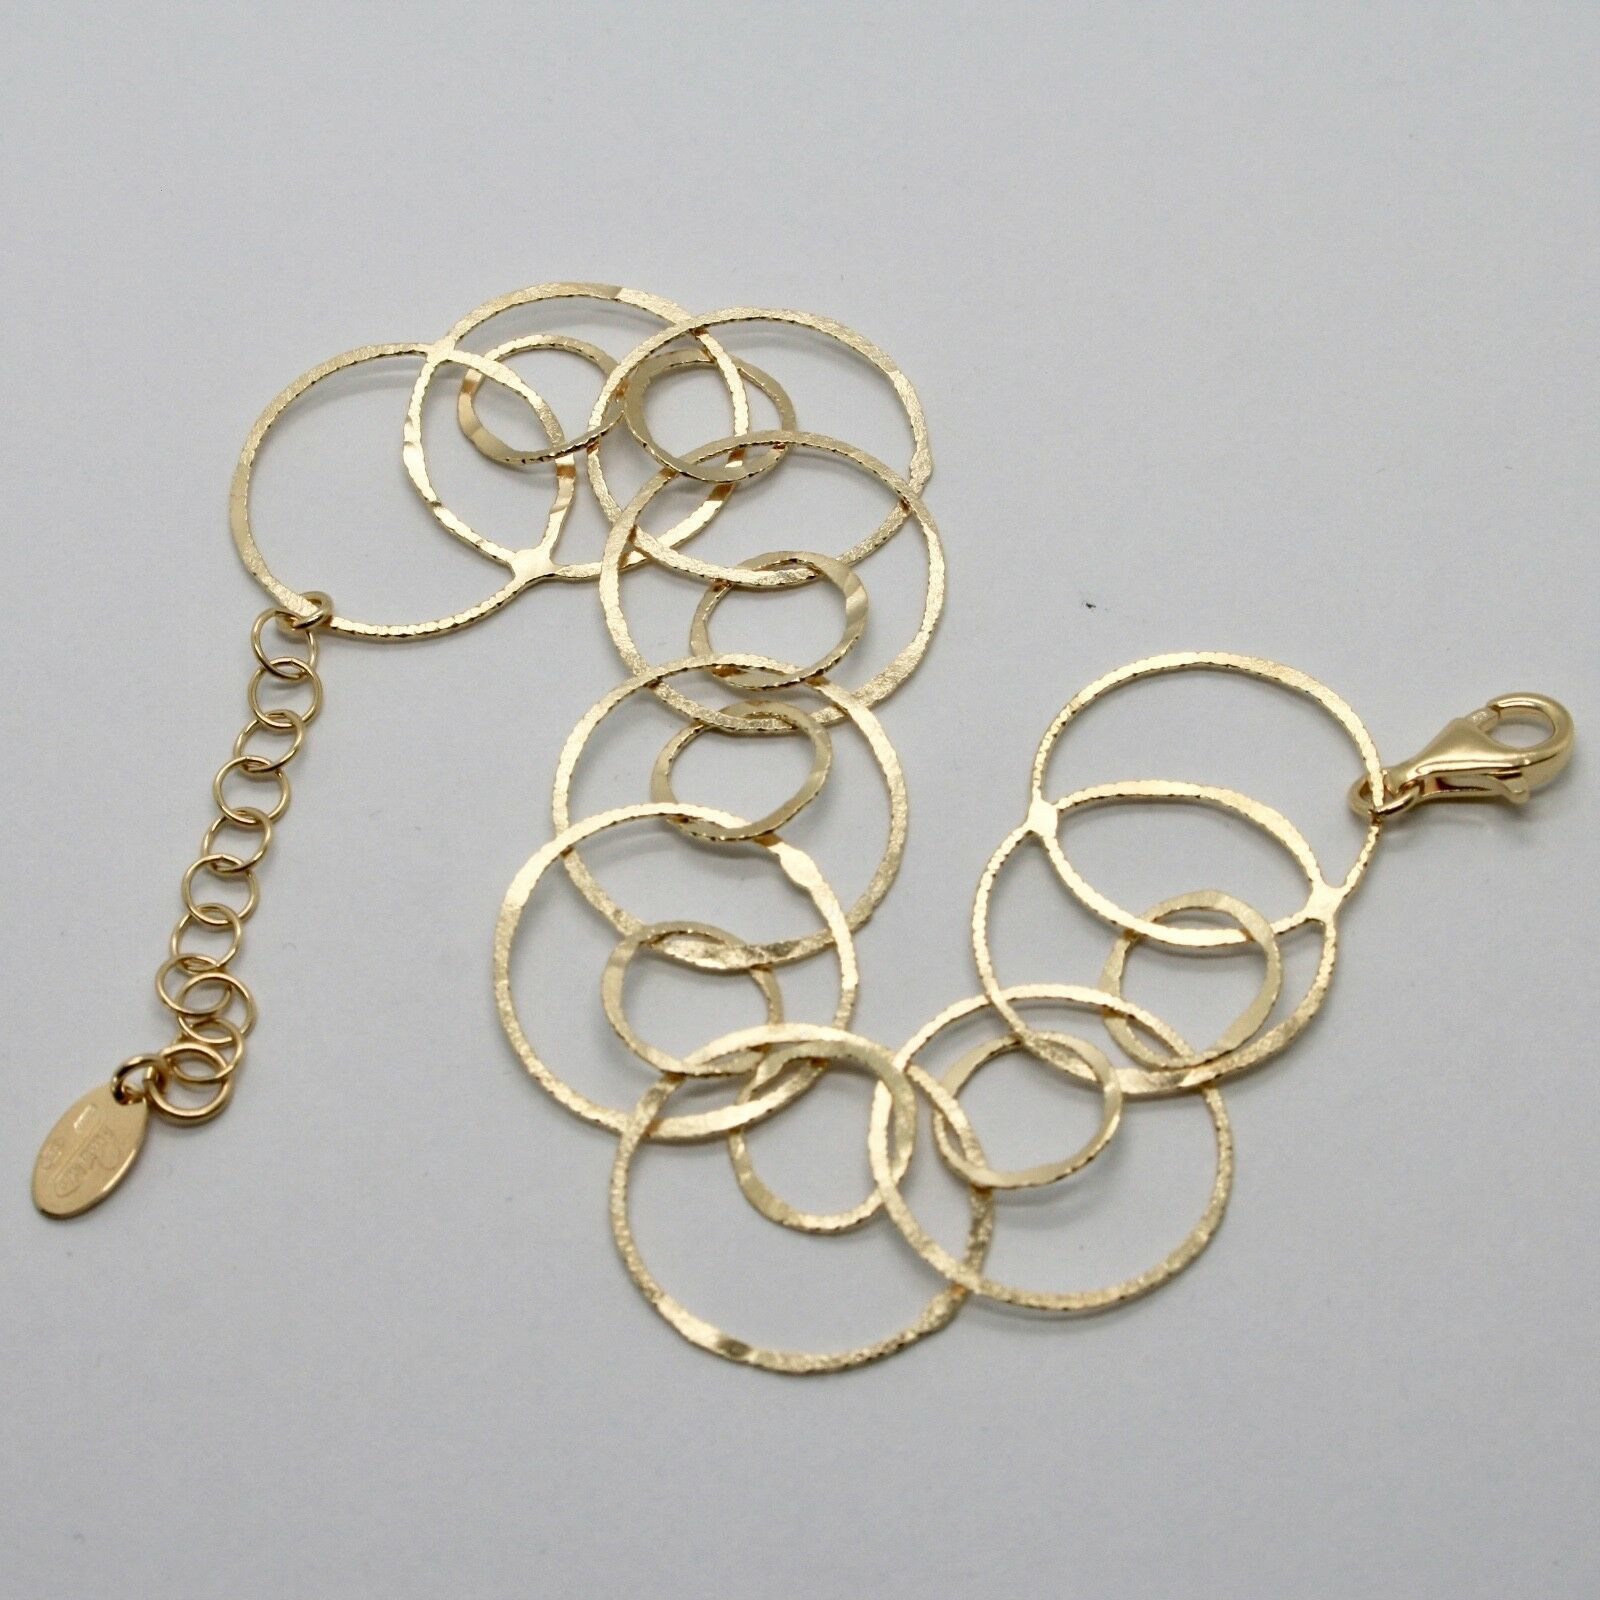 Armband 925 Silber Blatt Vergoldet Creolen Mattiert By Maria Ielpo Made in Italy